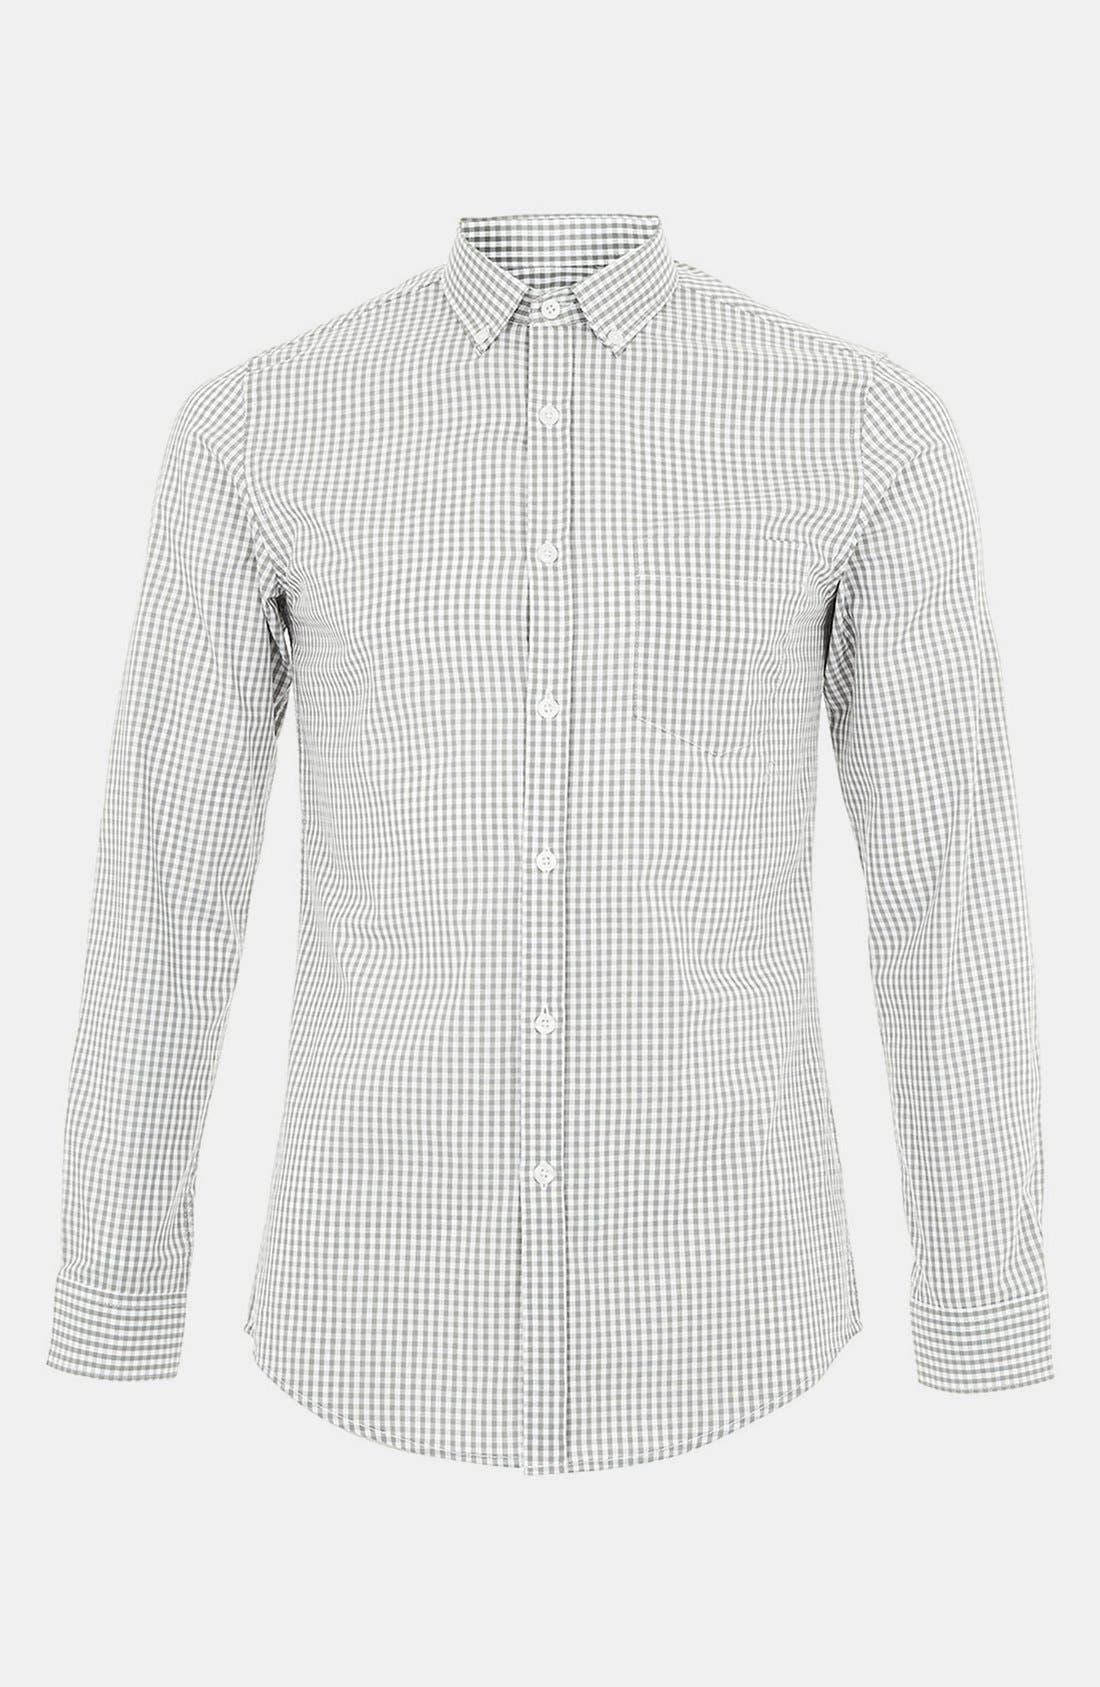 Main Image - Topman Gingham Check Shirt